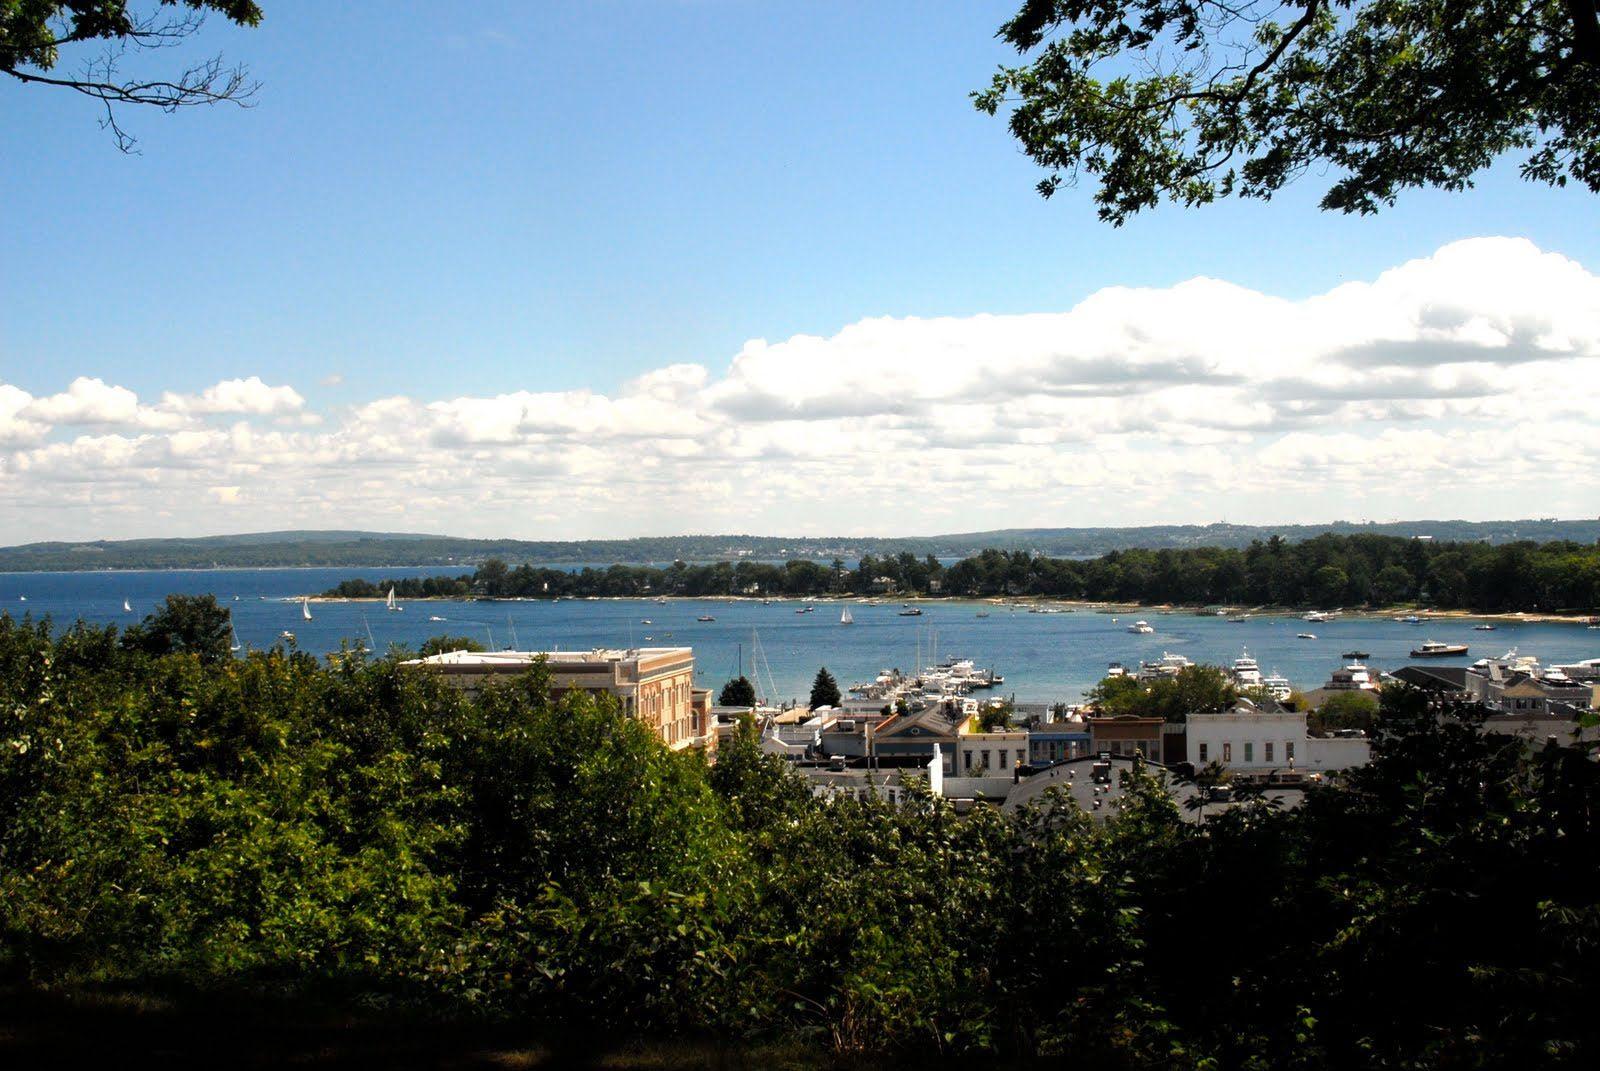 Harbor springs harbor springs dolores park michigan